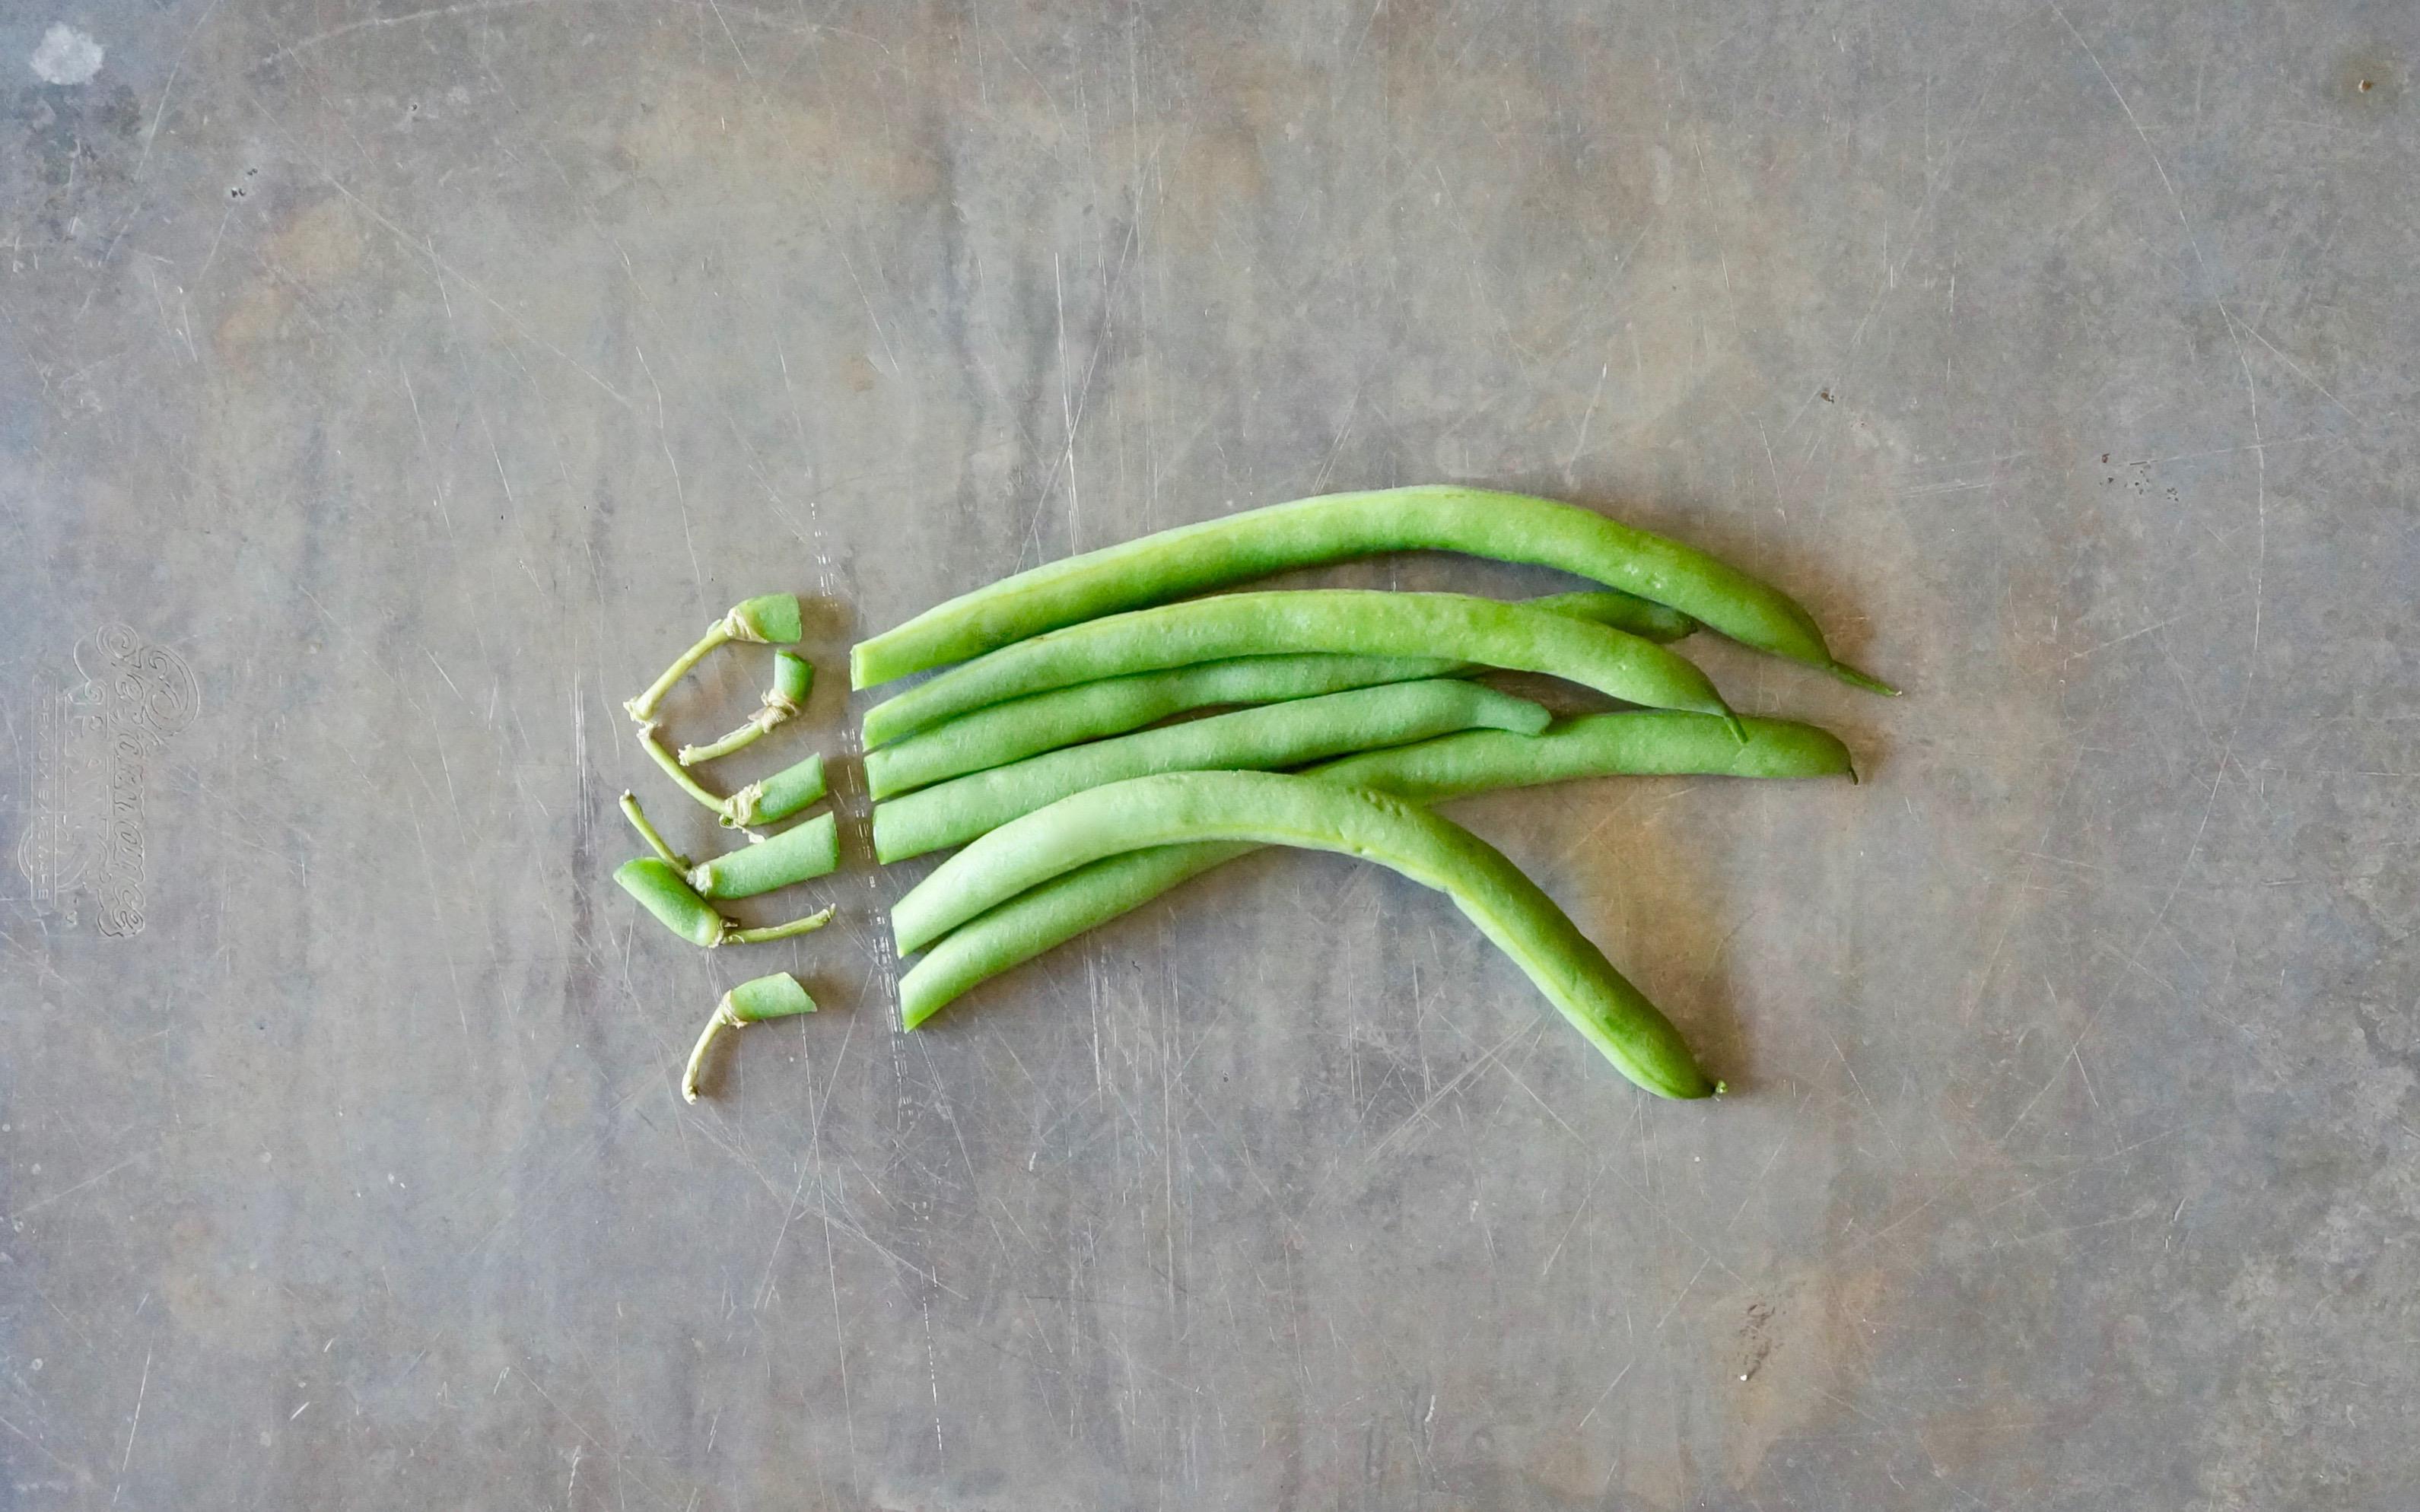 How-To-Snap-Green-Beans-Rebecca-Gordon-Publisher-Buttermilk-Lipstick-Culinary-Entertaining-Technique-Southern-Hostess-Rebecca-Gordon-Pastry-Chef-Birmingham-Alabama